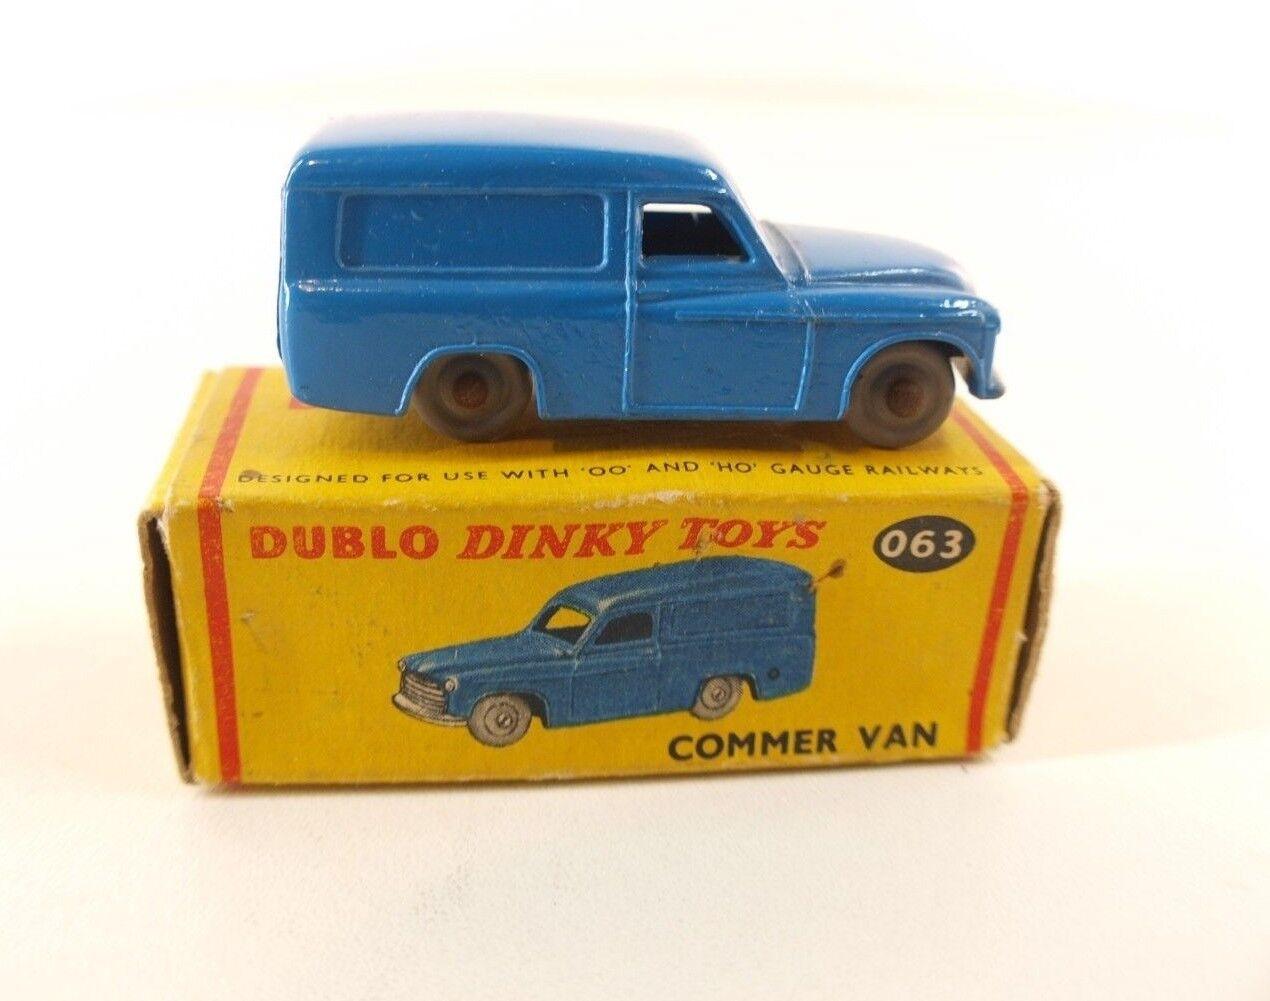 Dinky Toys GB 063 063 063 Dublo Commer van jamais joué en boîte MIB cf9fba